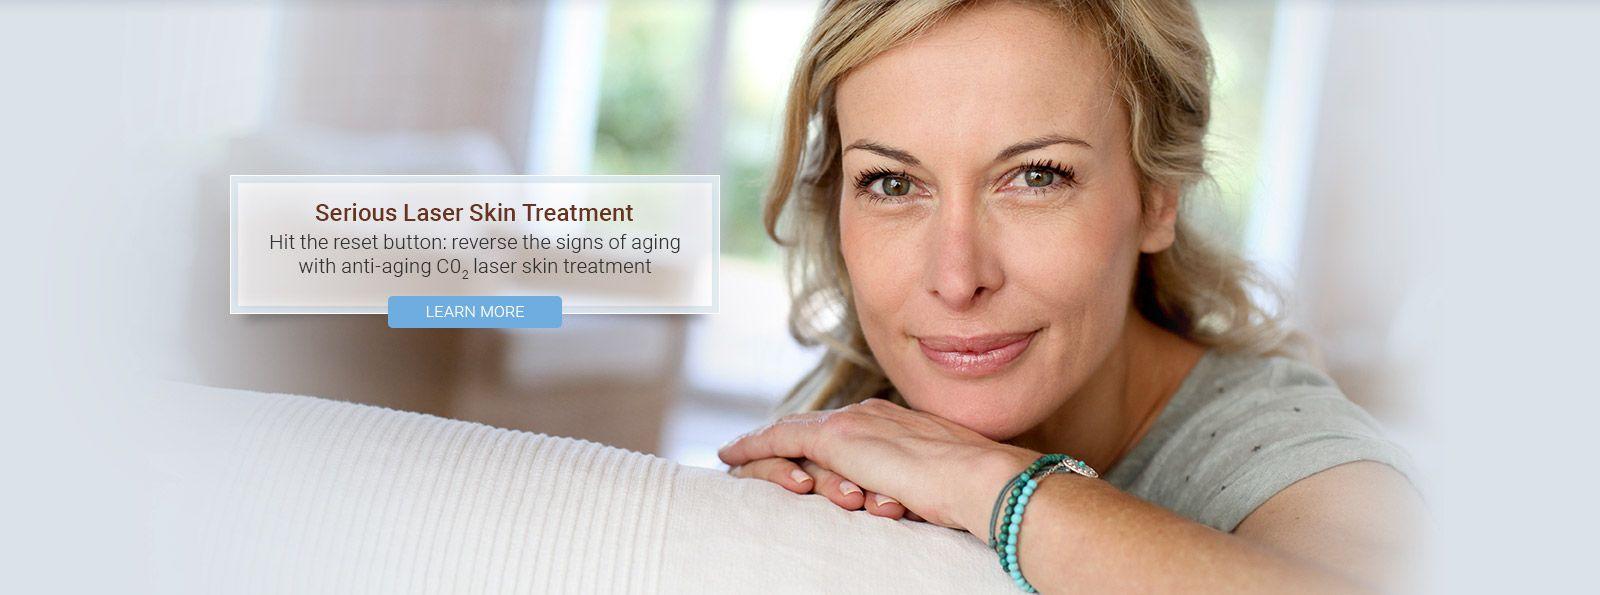 Serious Laser Skin Treatment